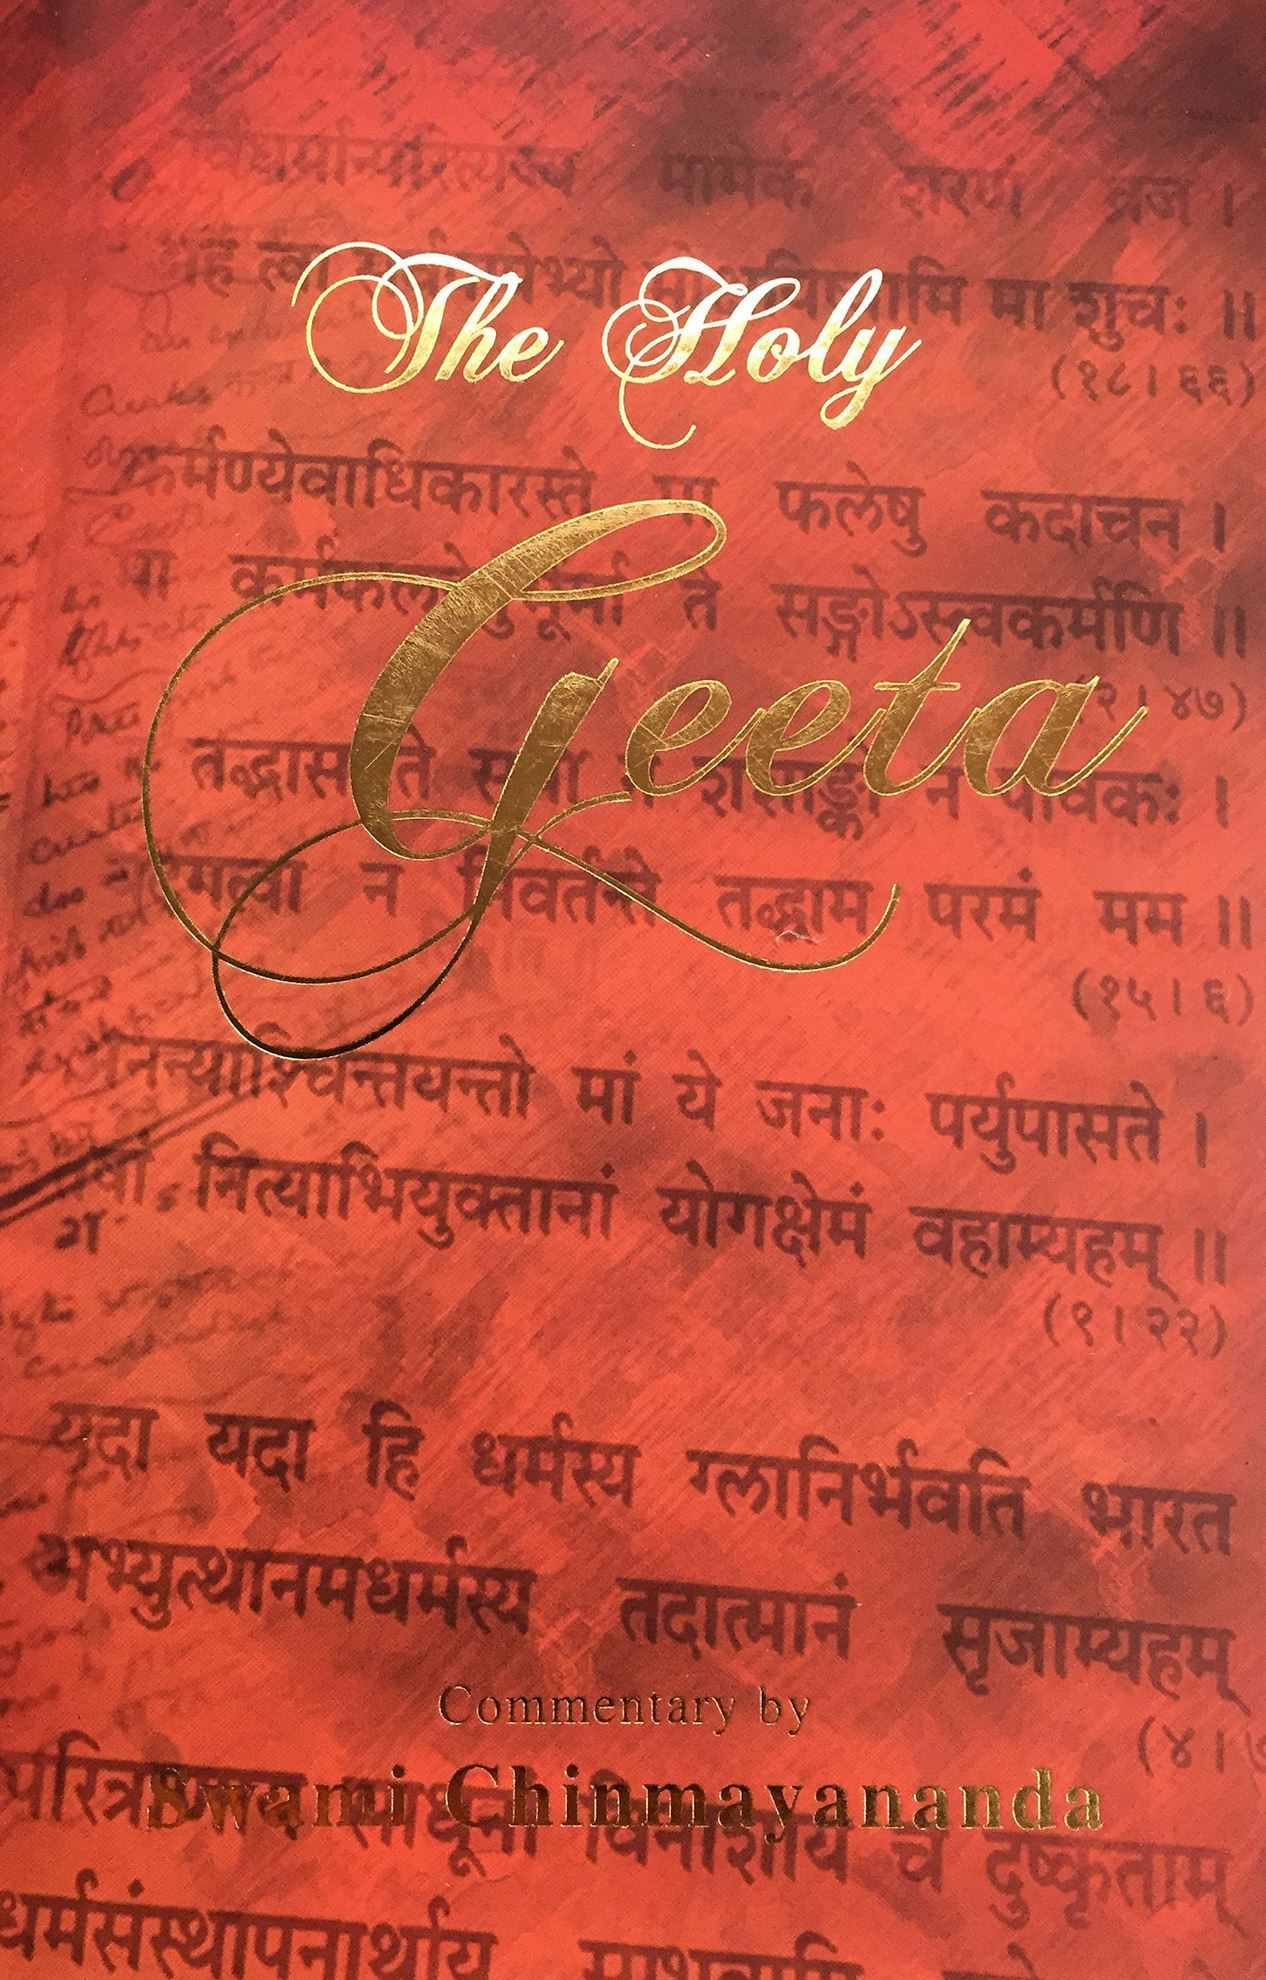 Message of the bhagavad mp3